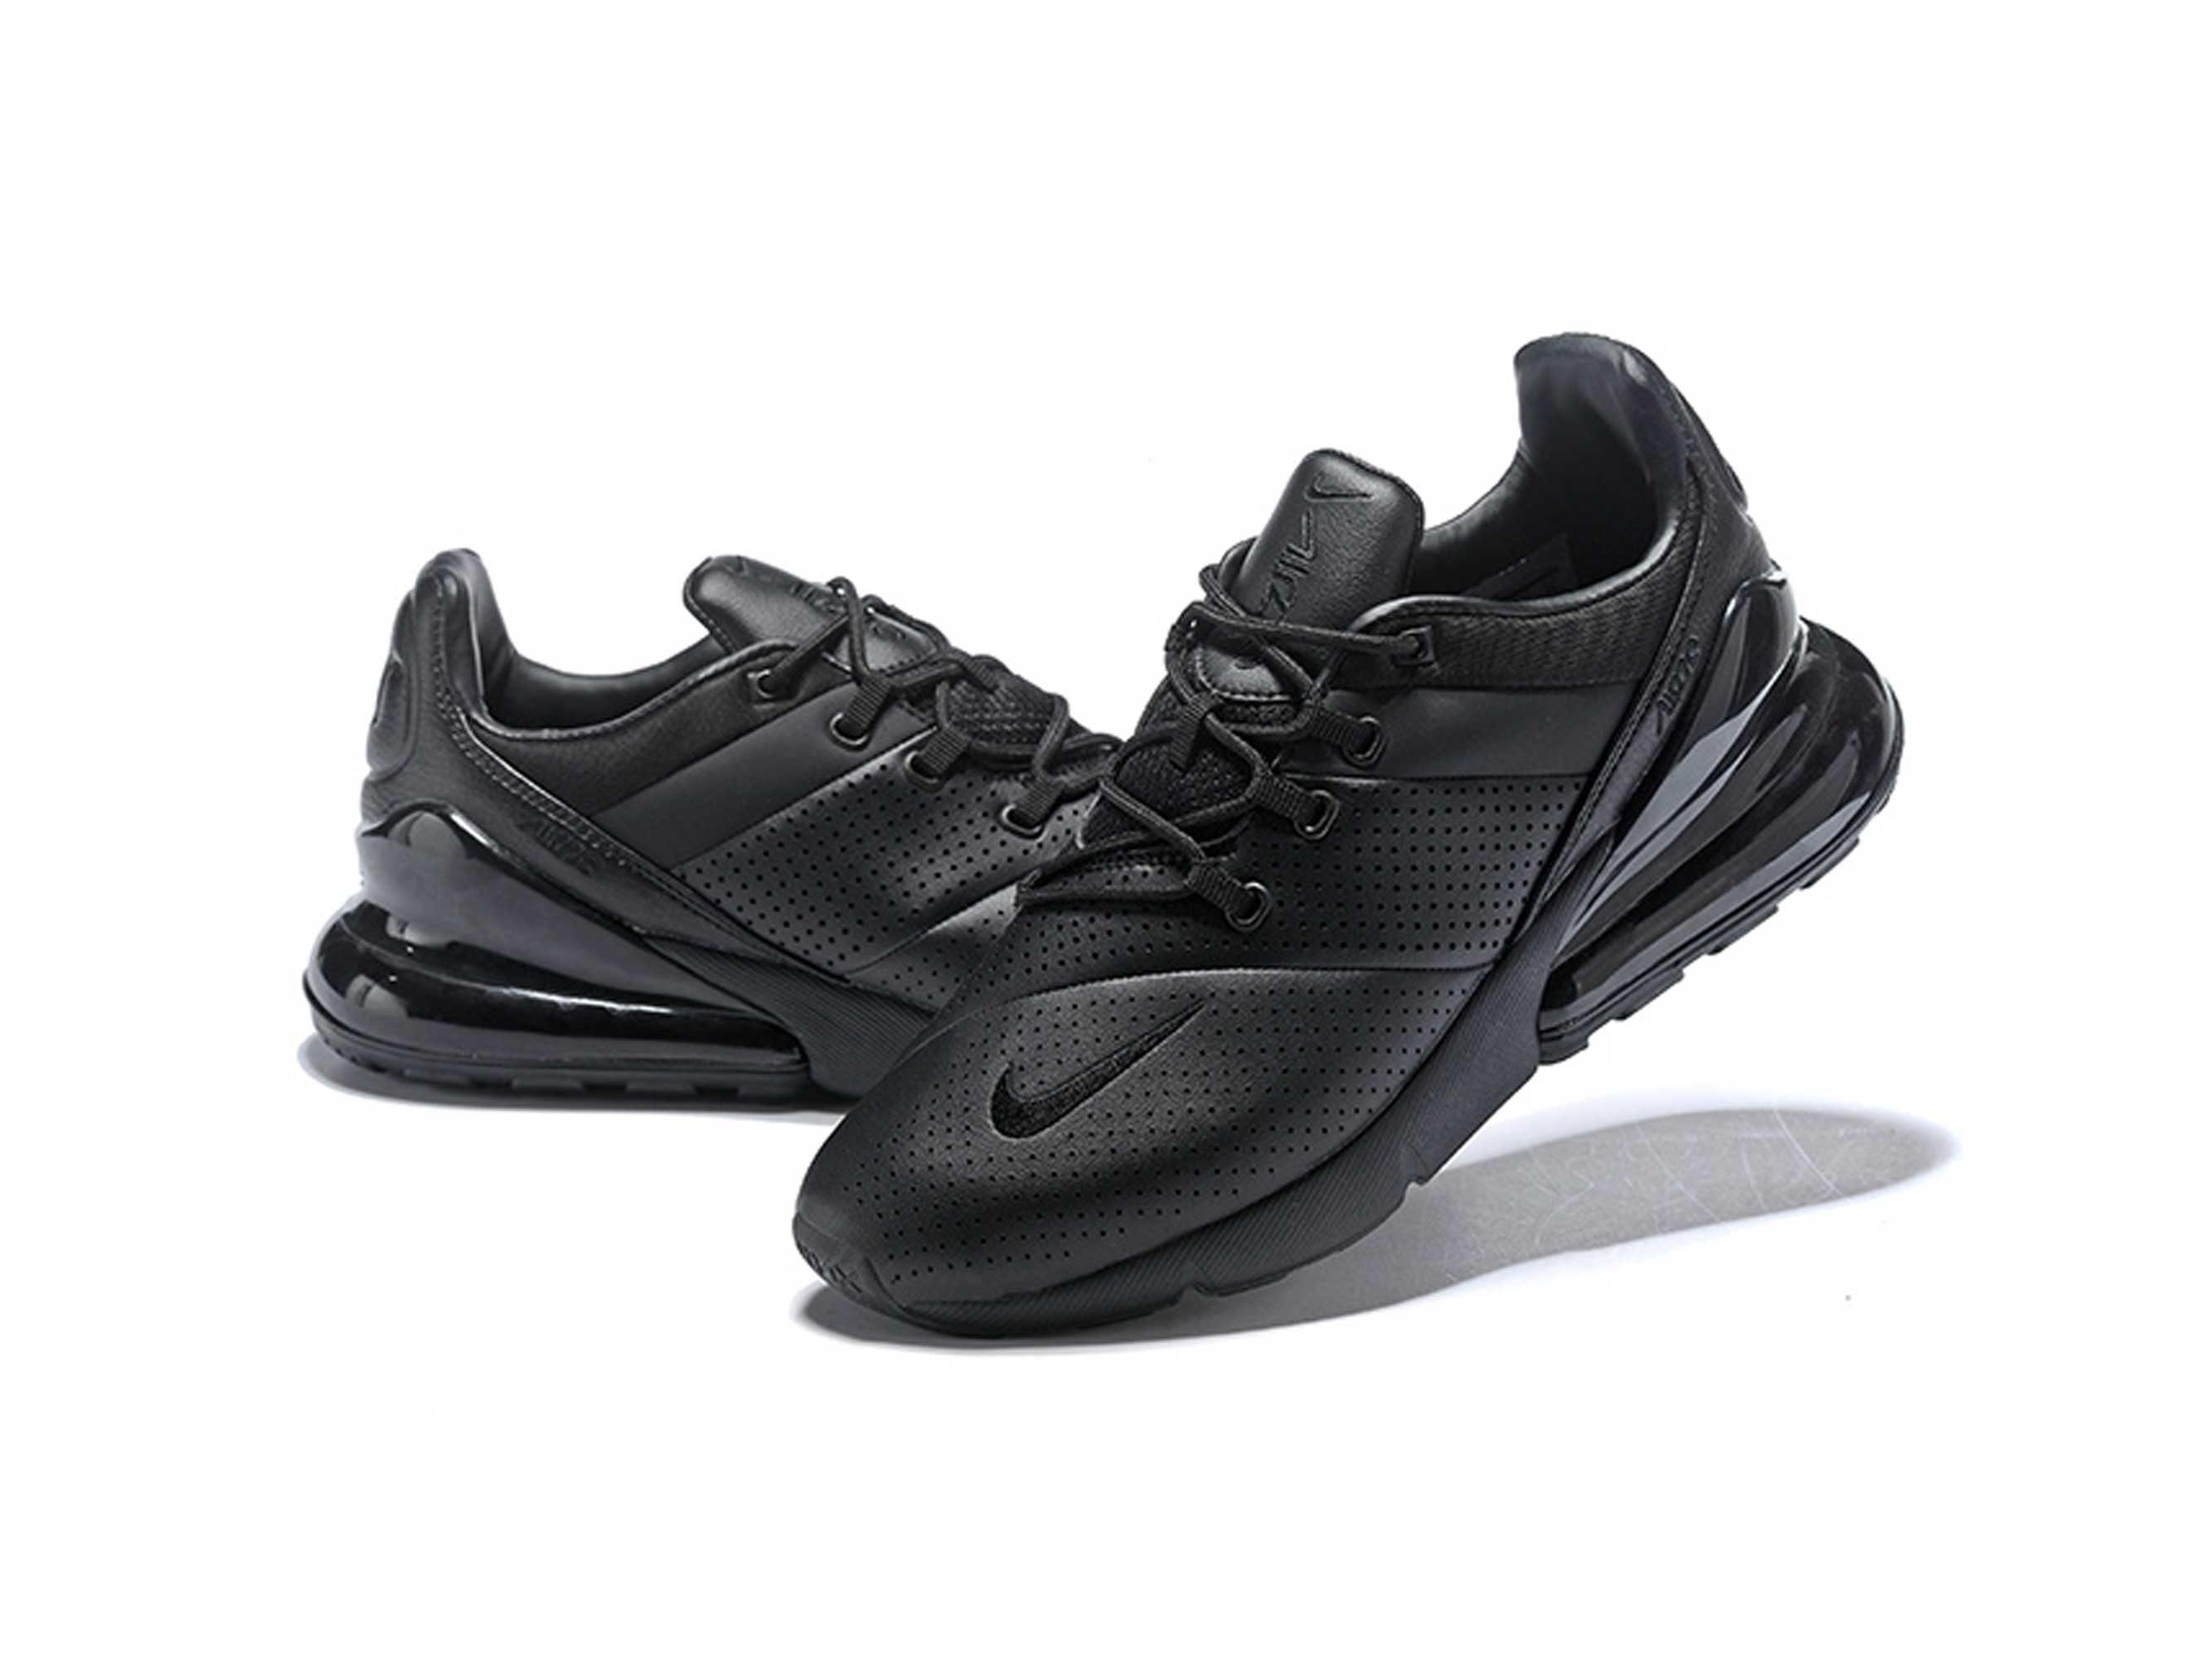 nike air max 270 black ao8283_010 купить